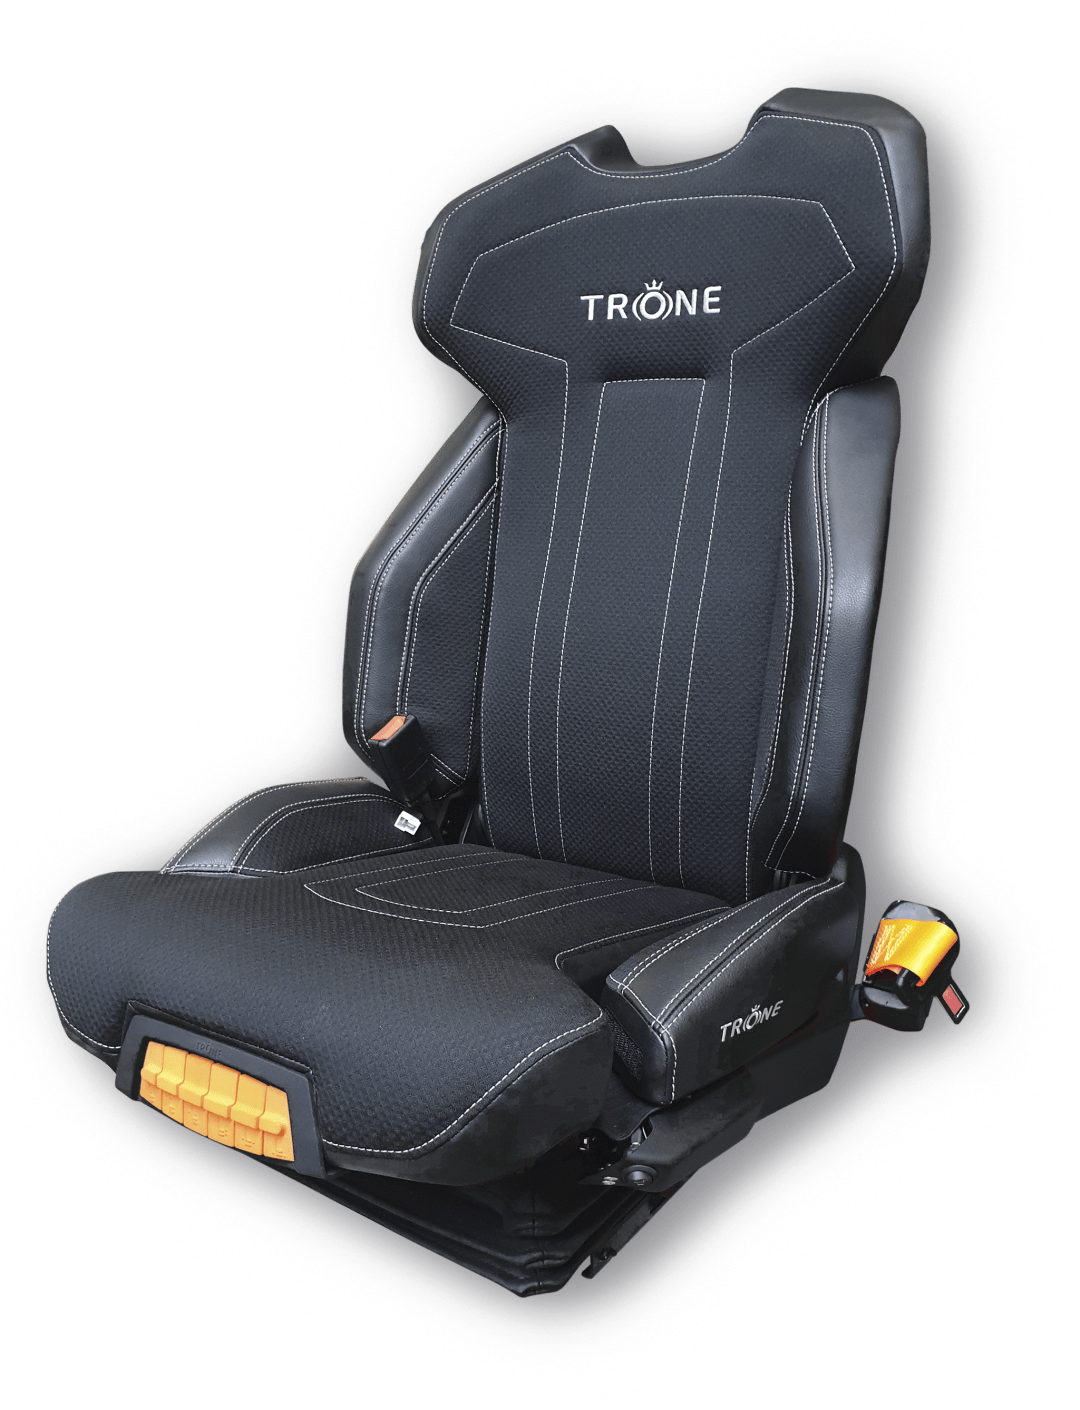 Trone-High-Back-Narrow-no-headrest